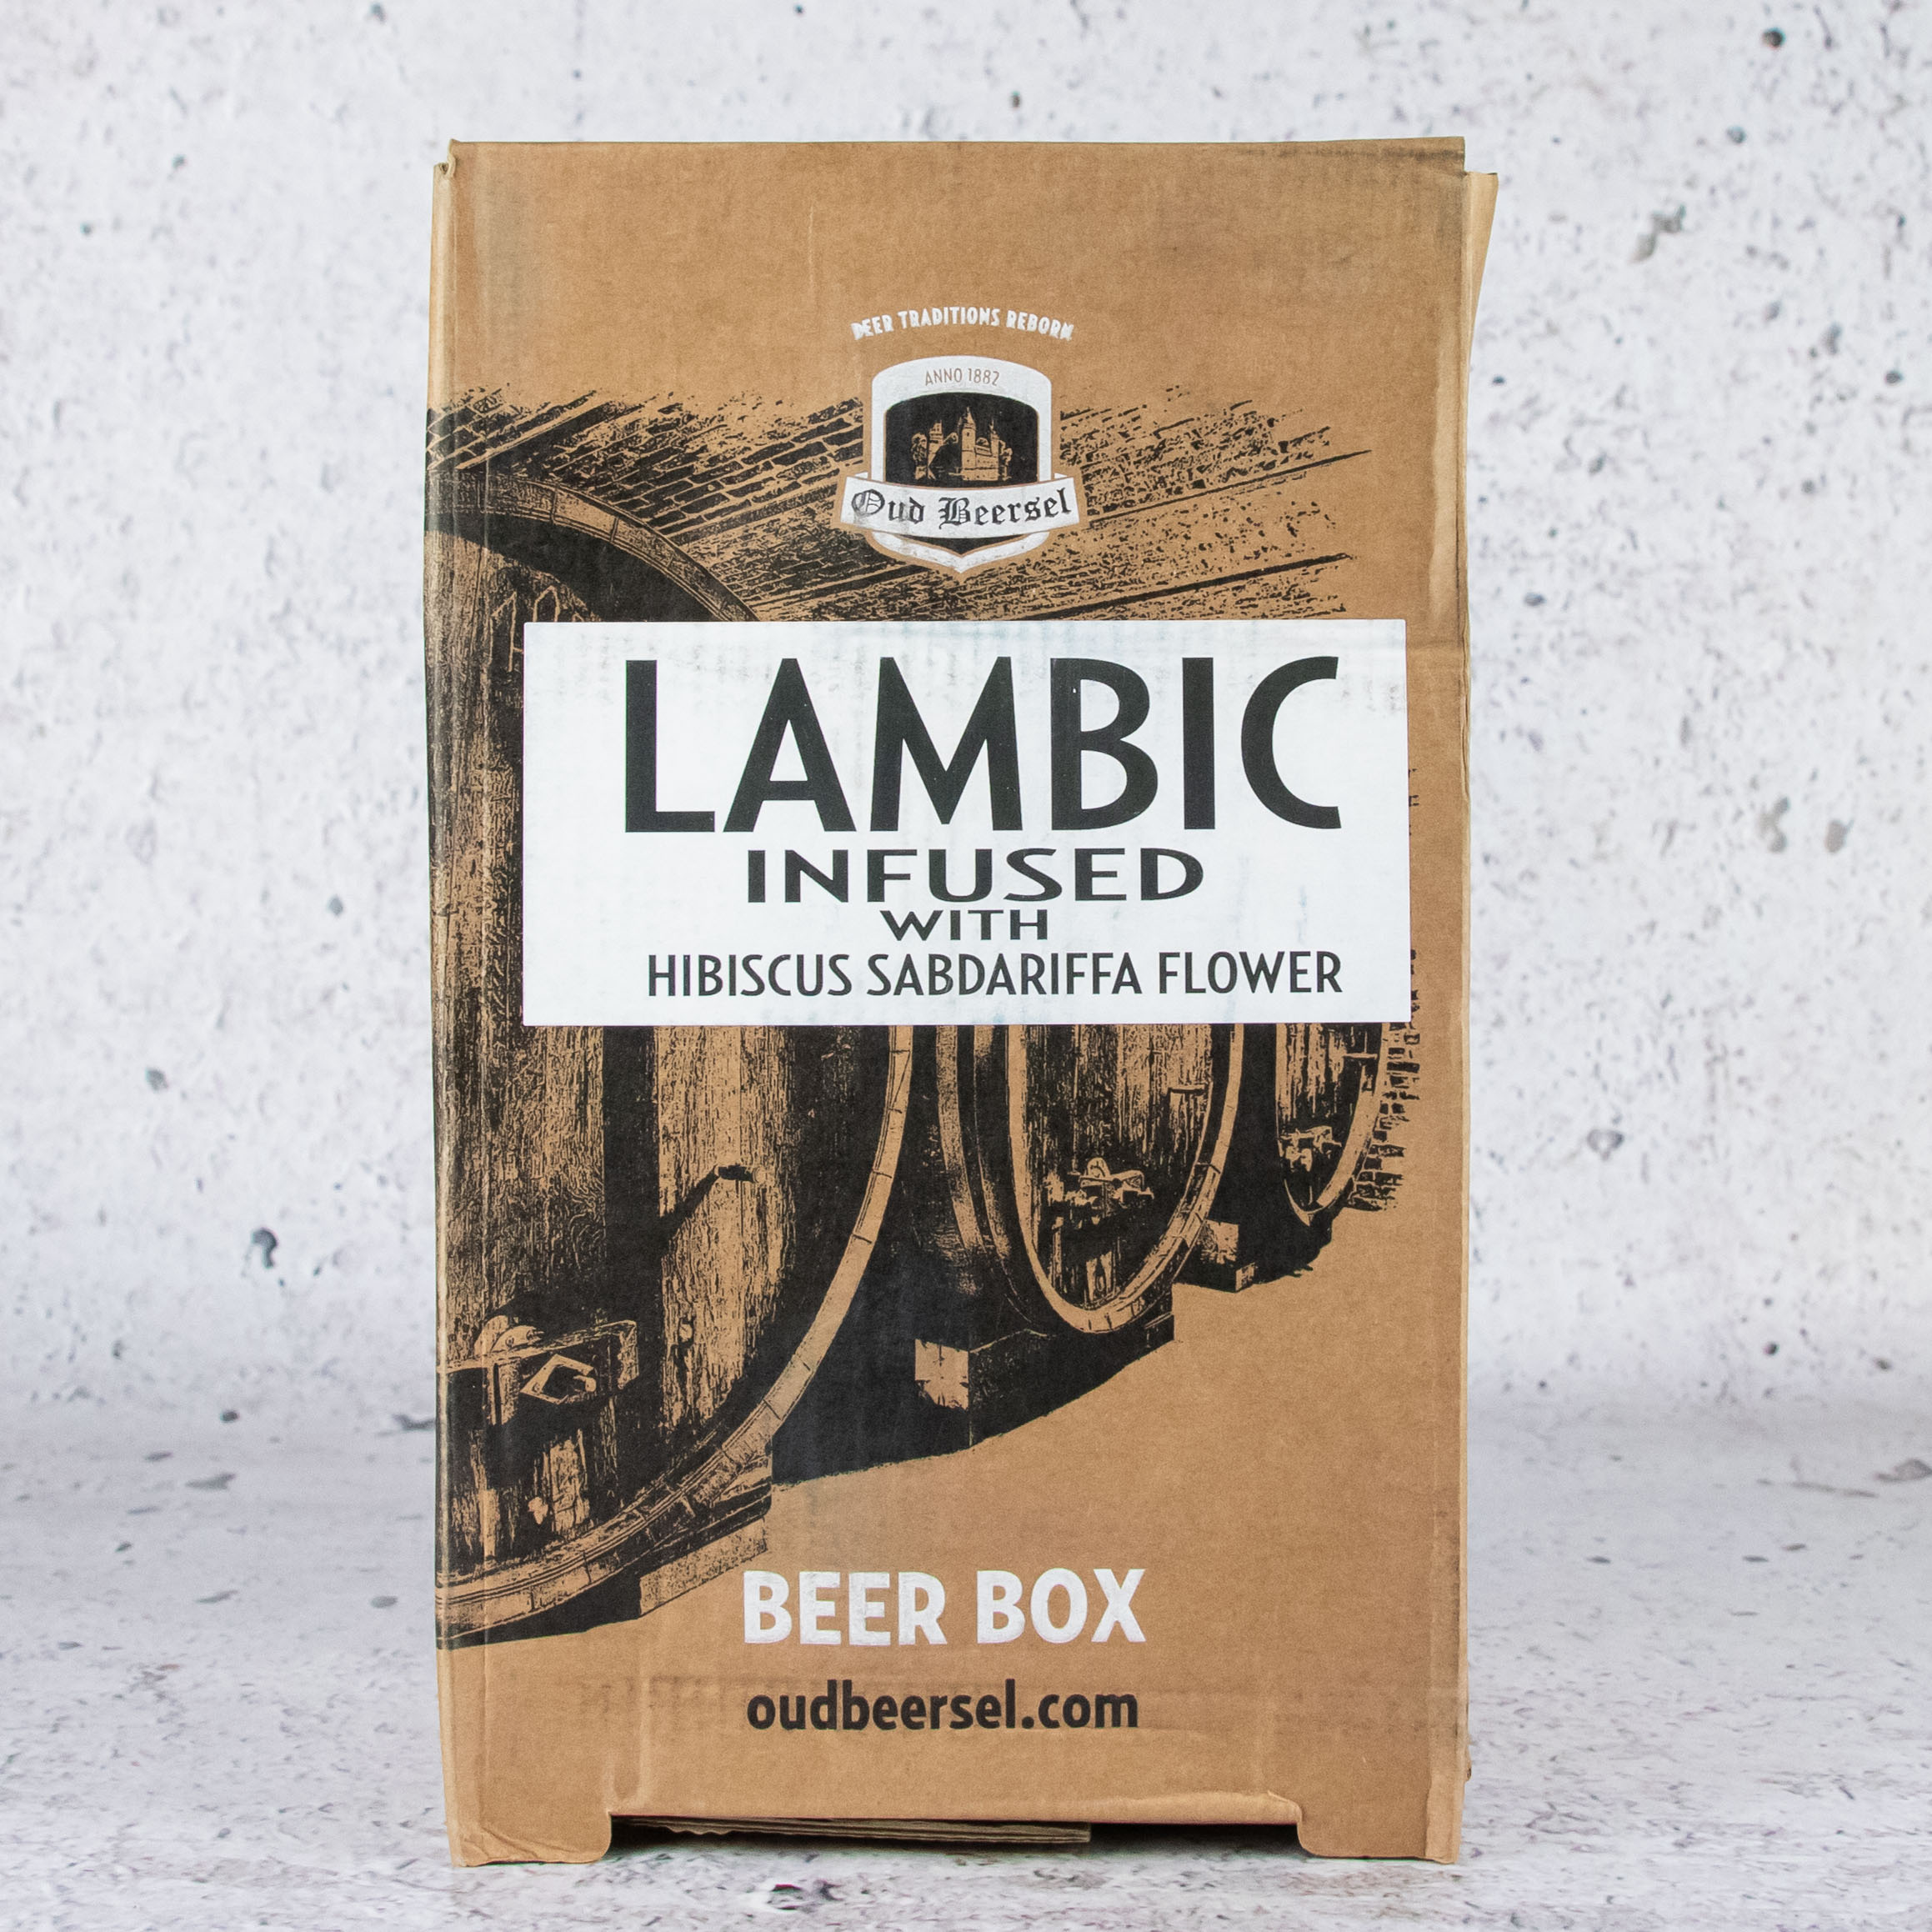 Oud Beersel Lambic Infused with Hibiscus Sabdariffa Flower 3.1 Litre Box